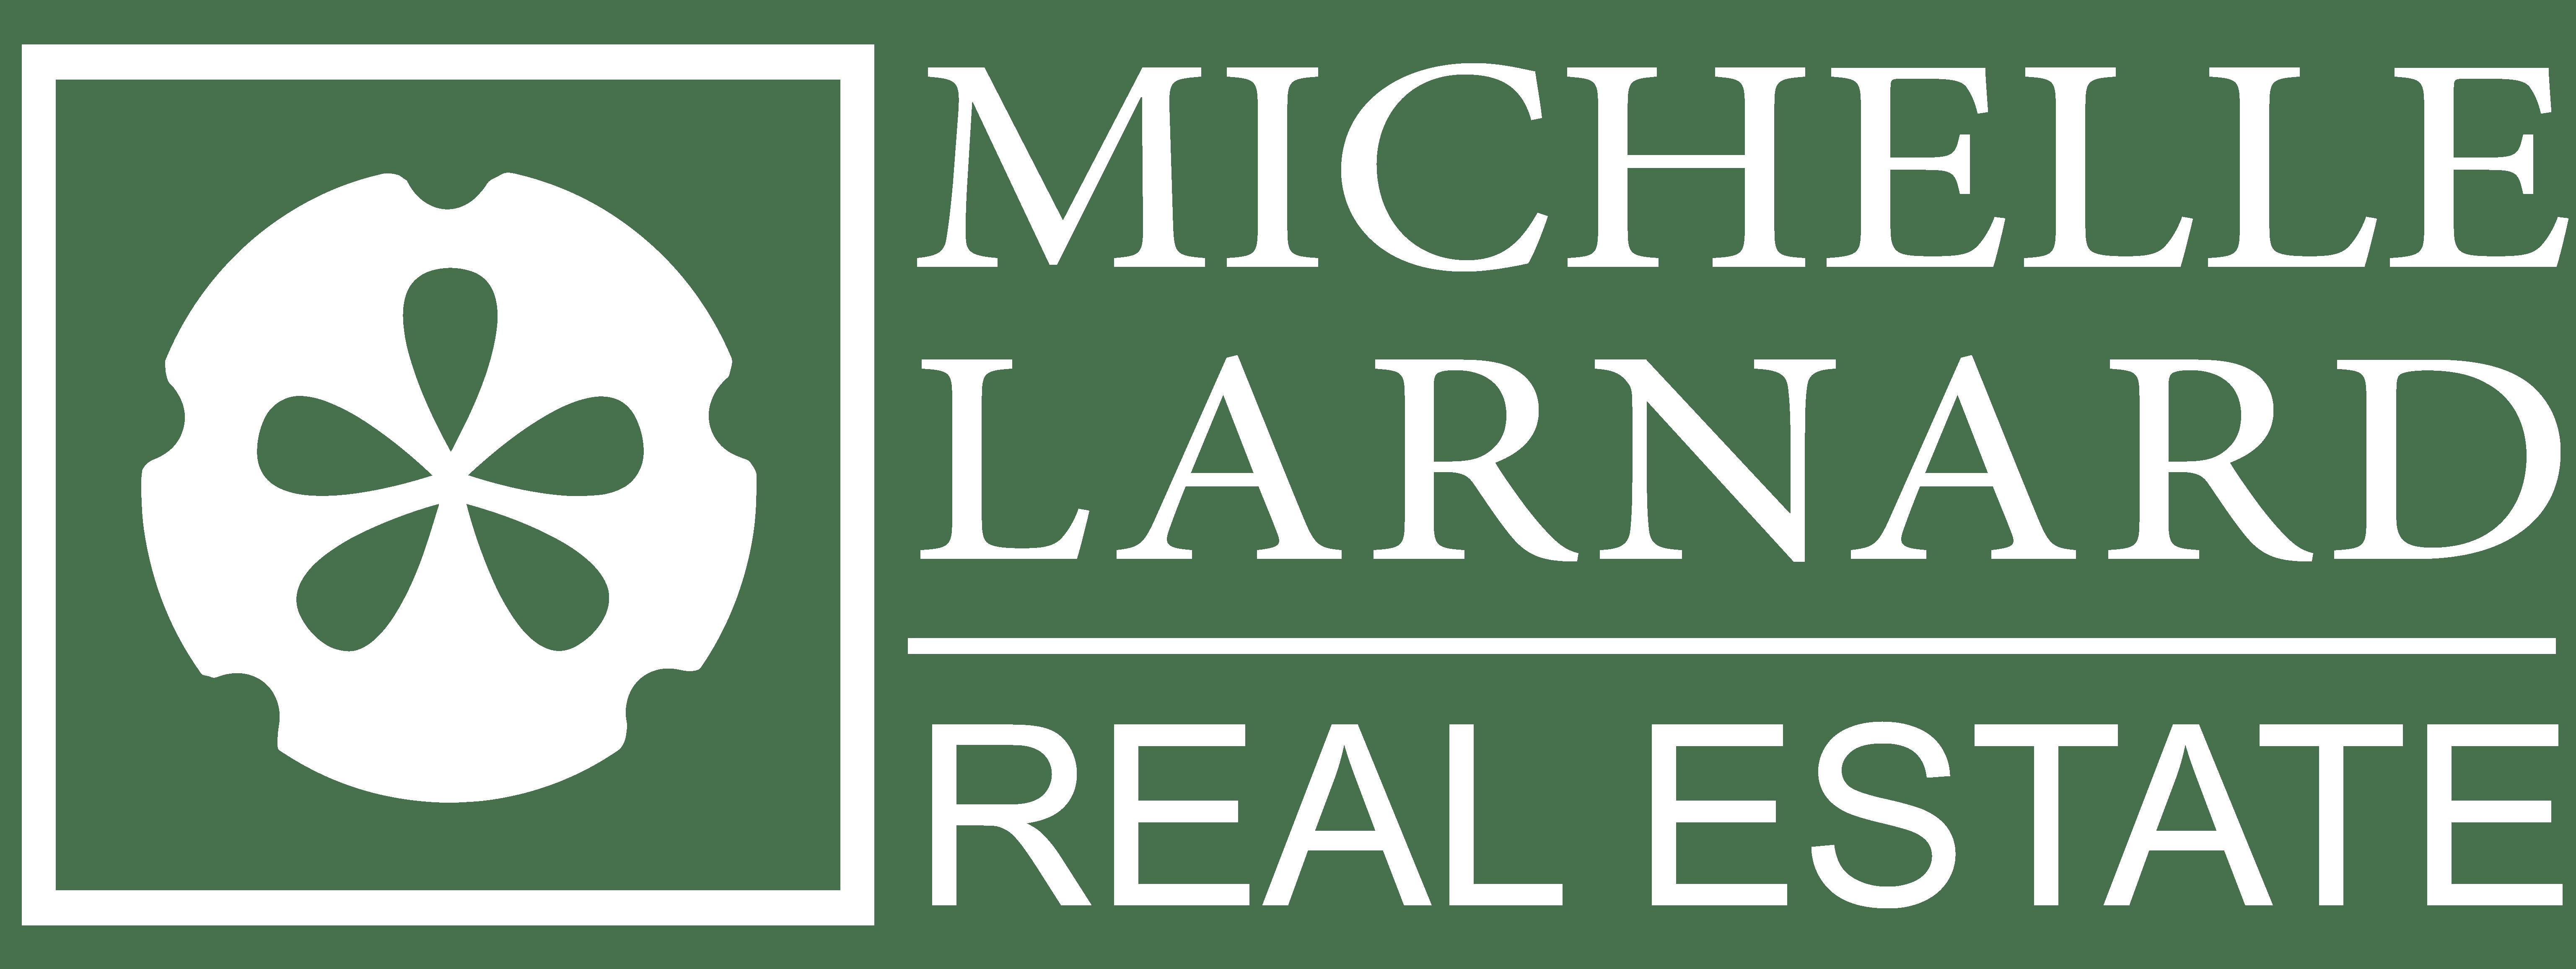 Michelle Larnard Real Estate Logo